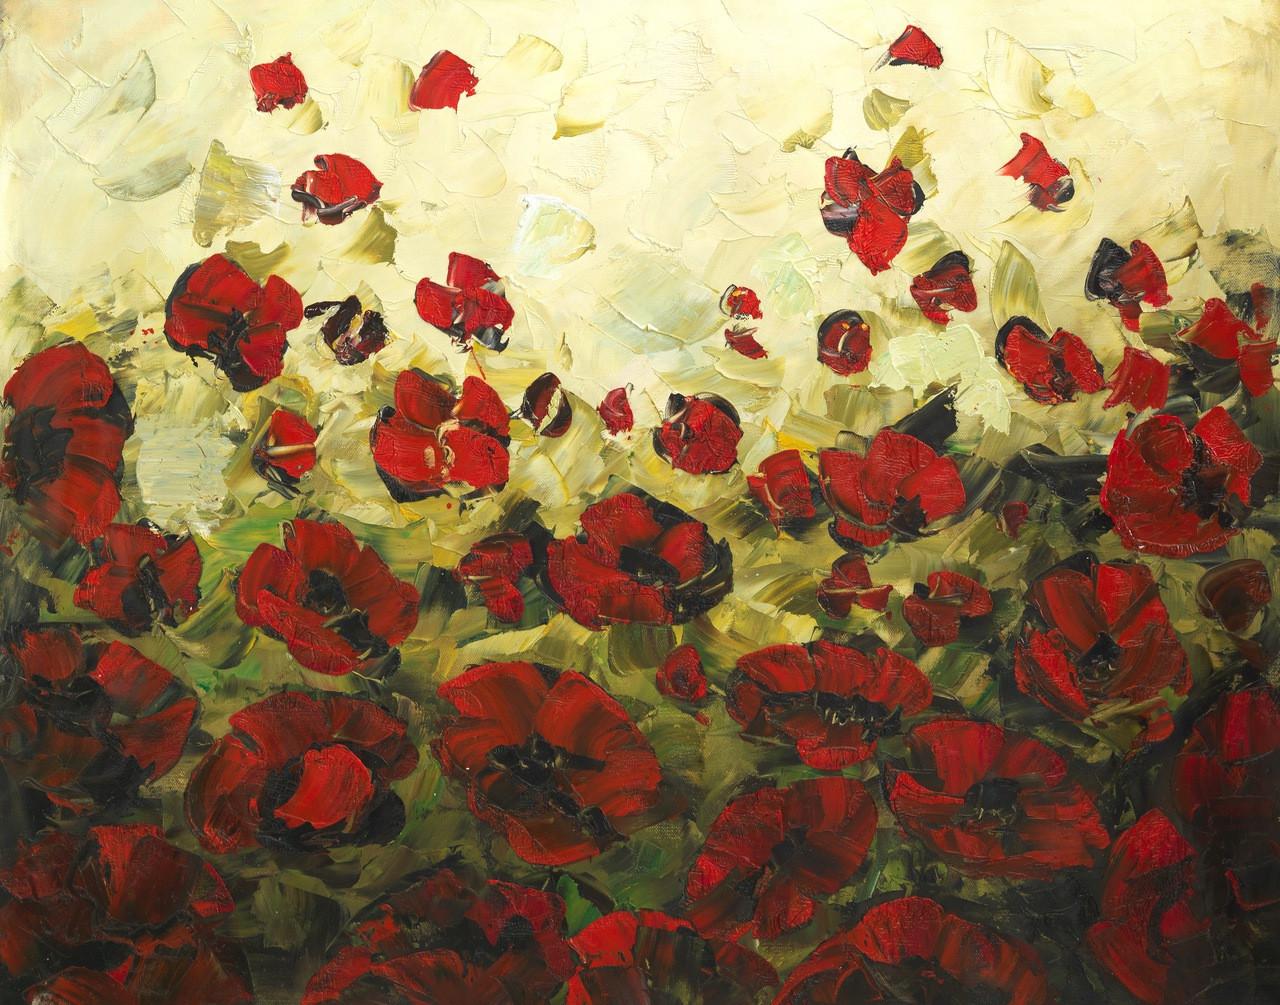 Buy beautiful red flowers handmade painting by community artists beautiful flower paintingsflower paintingsred flower paintingsfloral paintingsbeautiful red izmirmasajfo